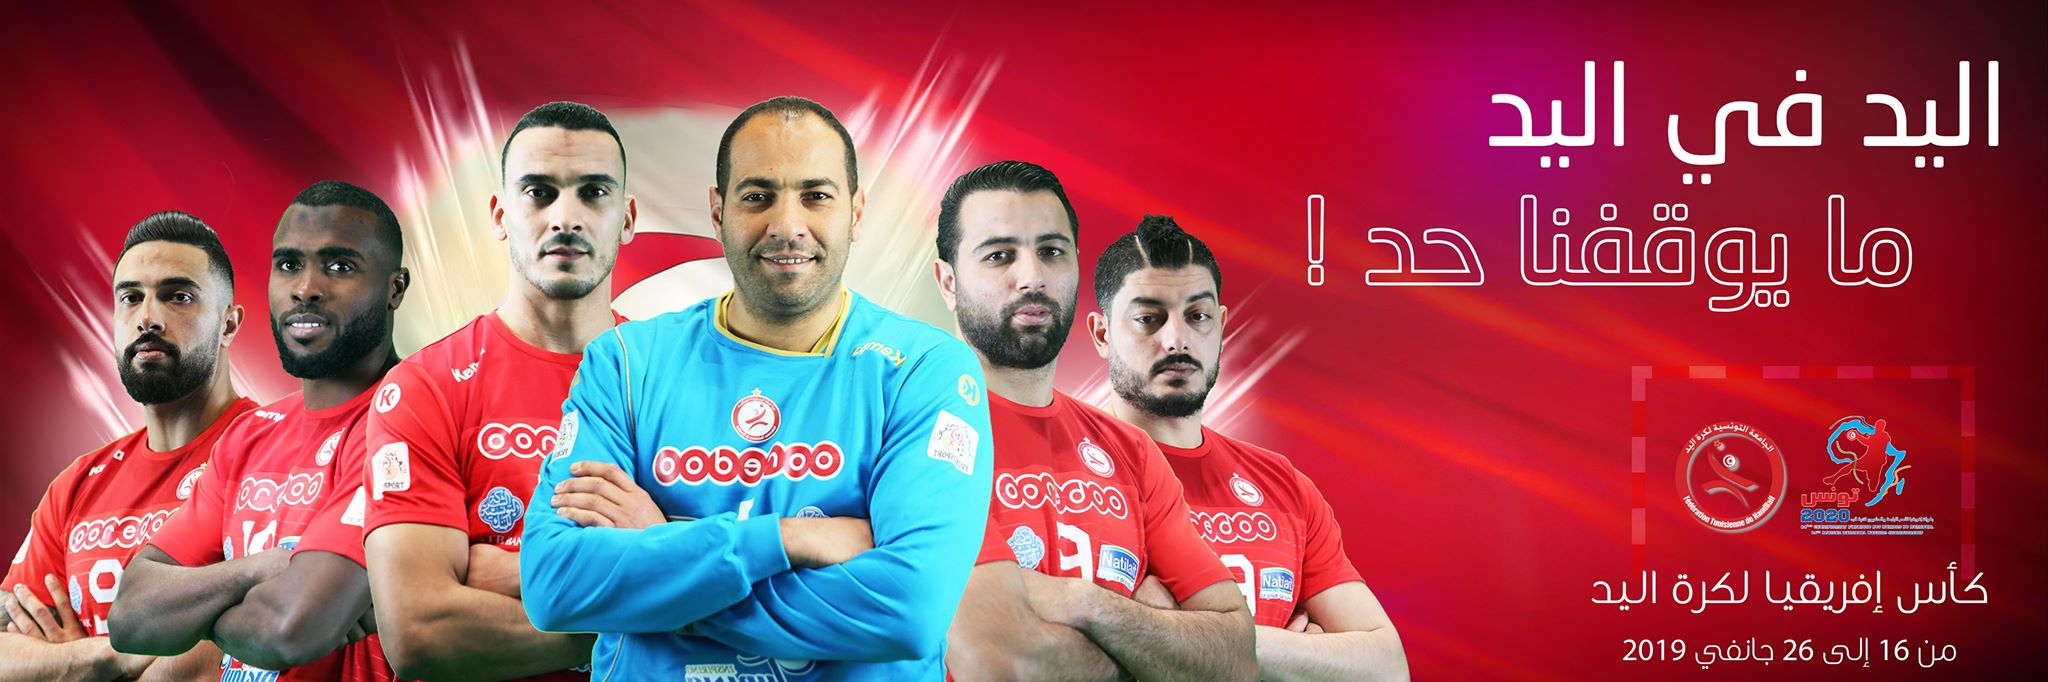 Coupe d'Afrique des Nations Handball 2020 : By FTHB